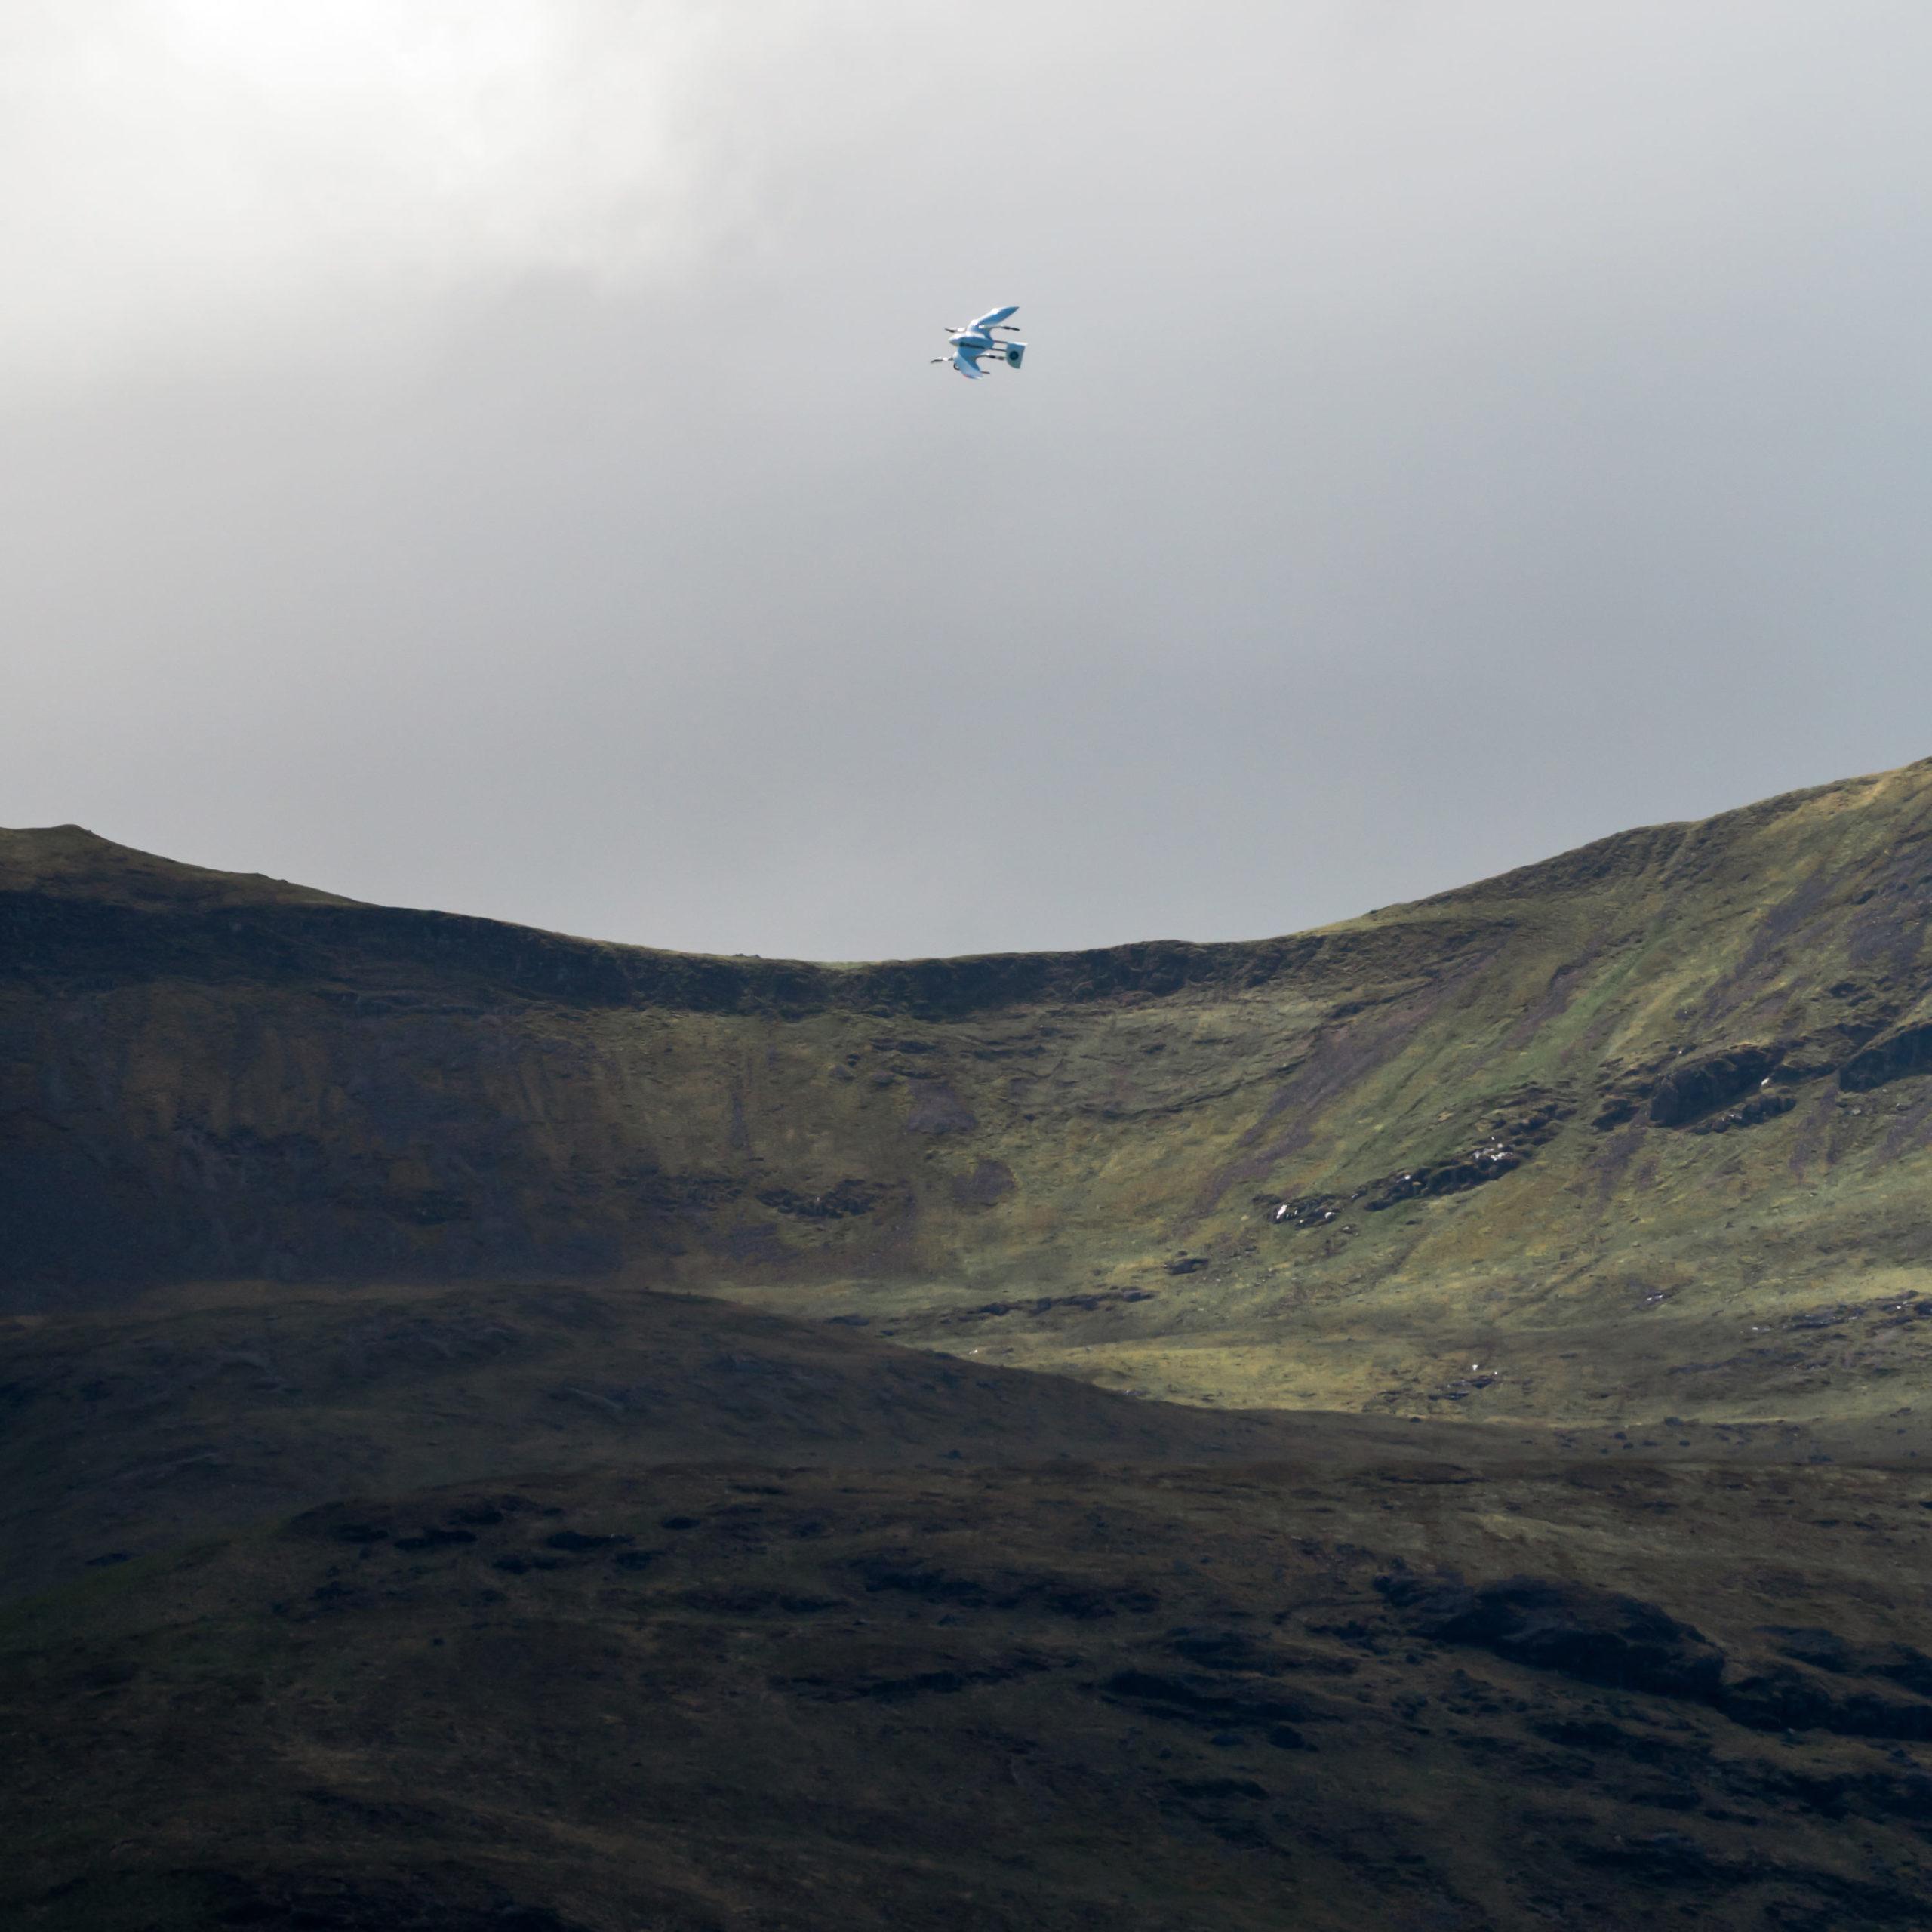 Wingcopter_Schottland-13-web